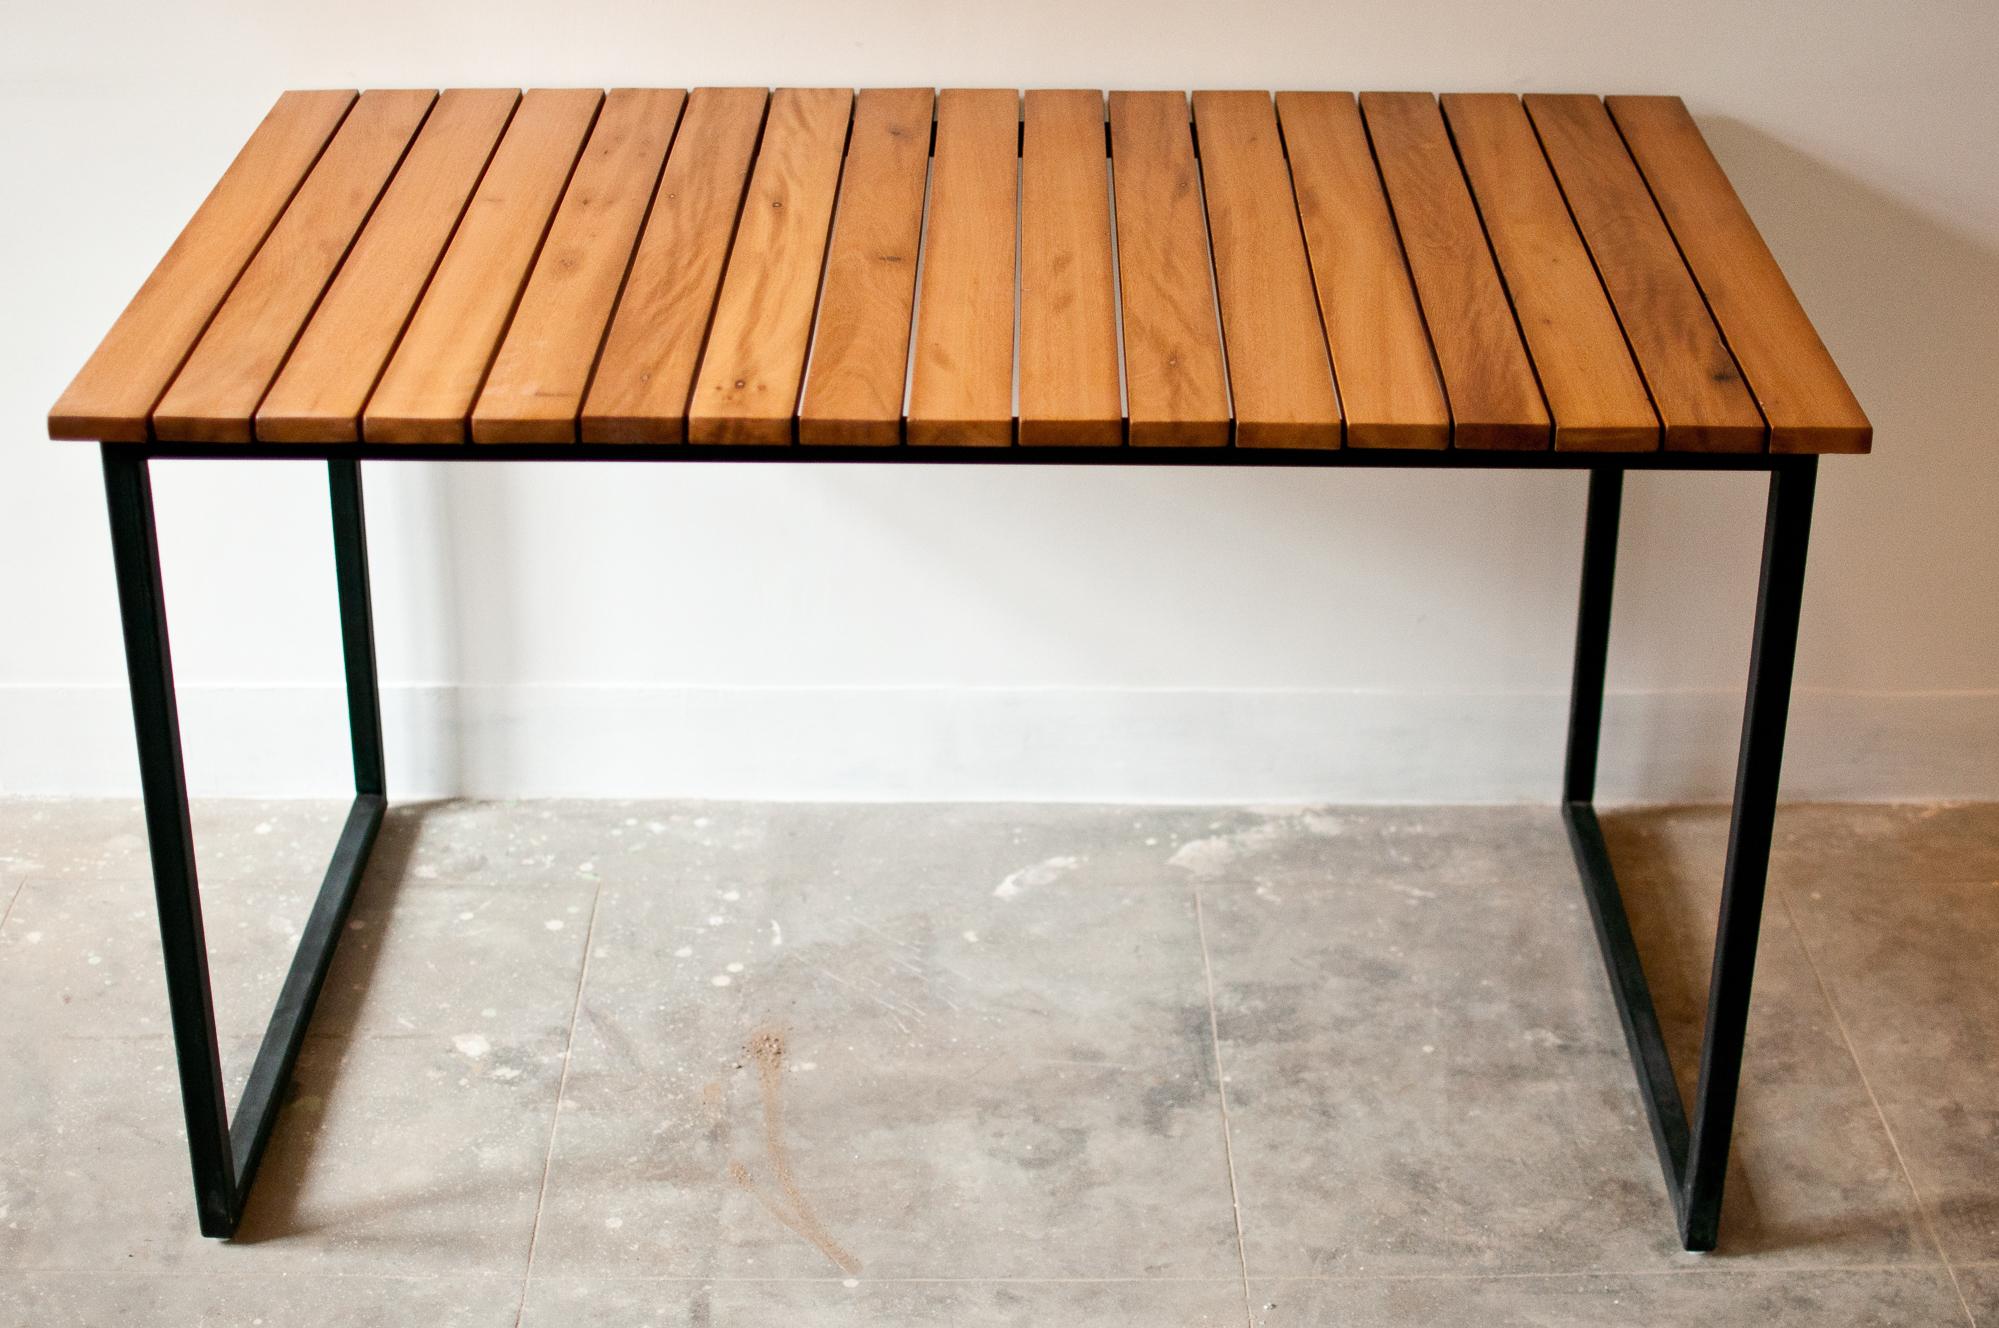 Medium size (M) - Sal wood